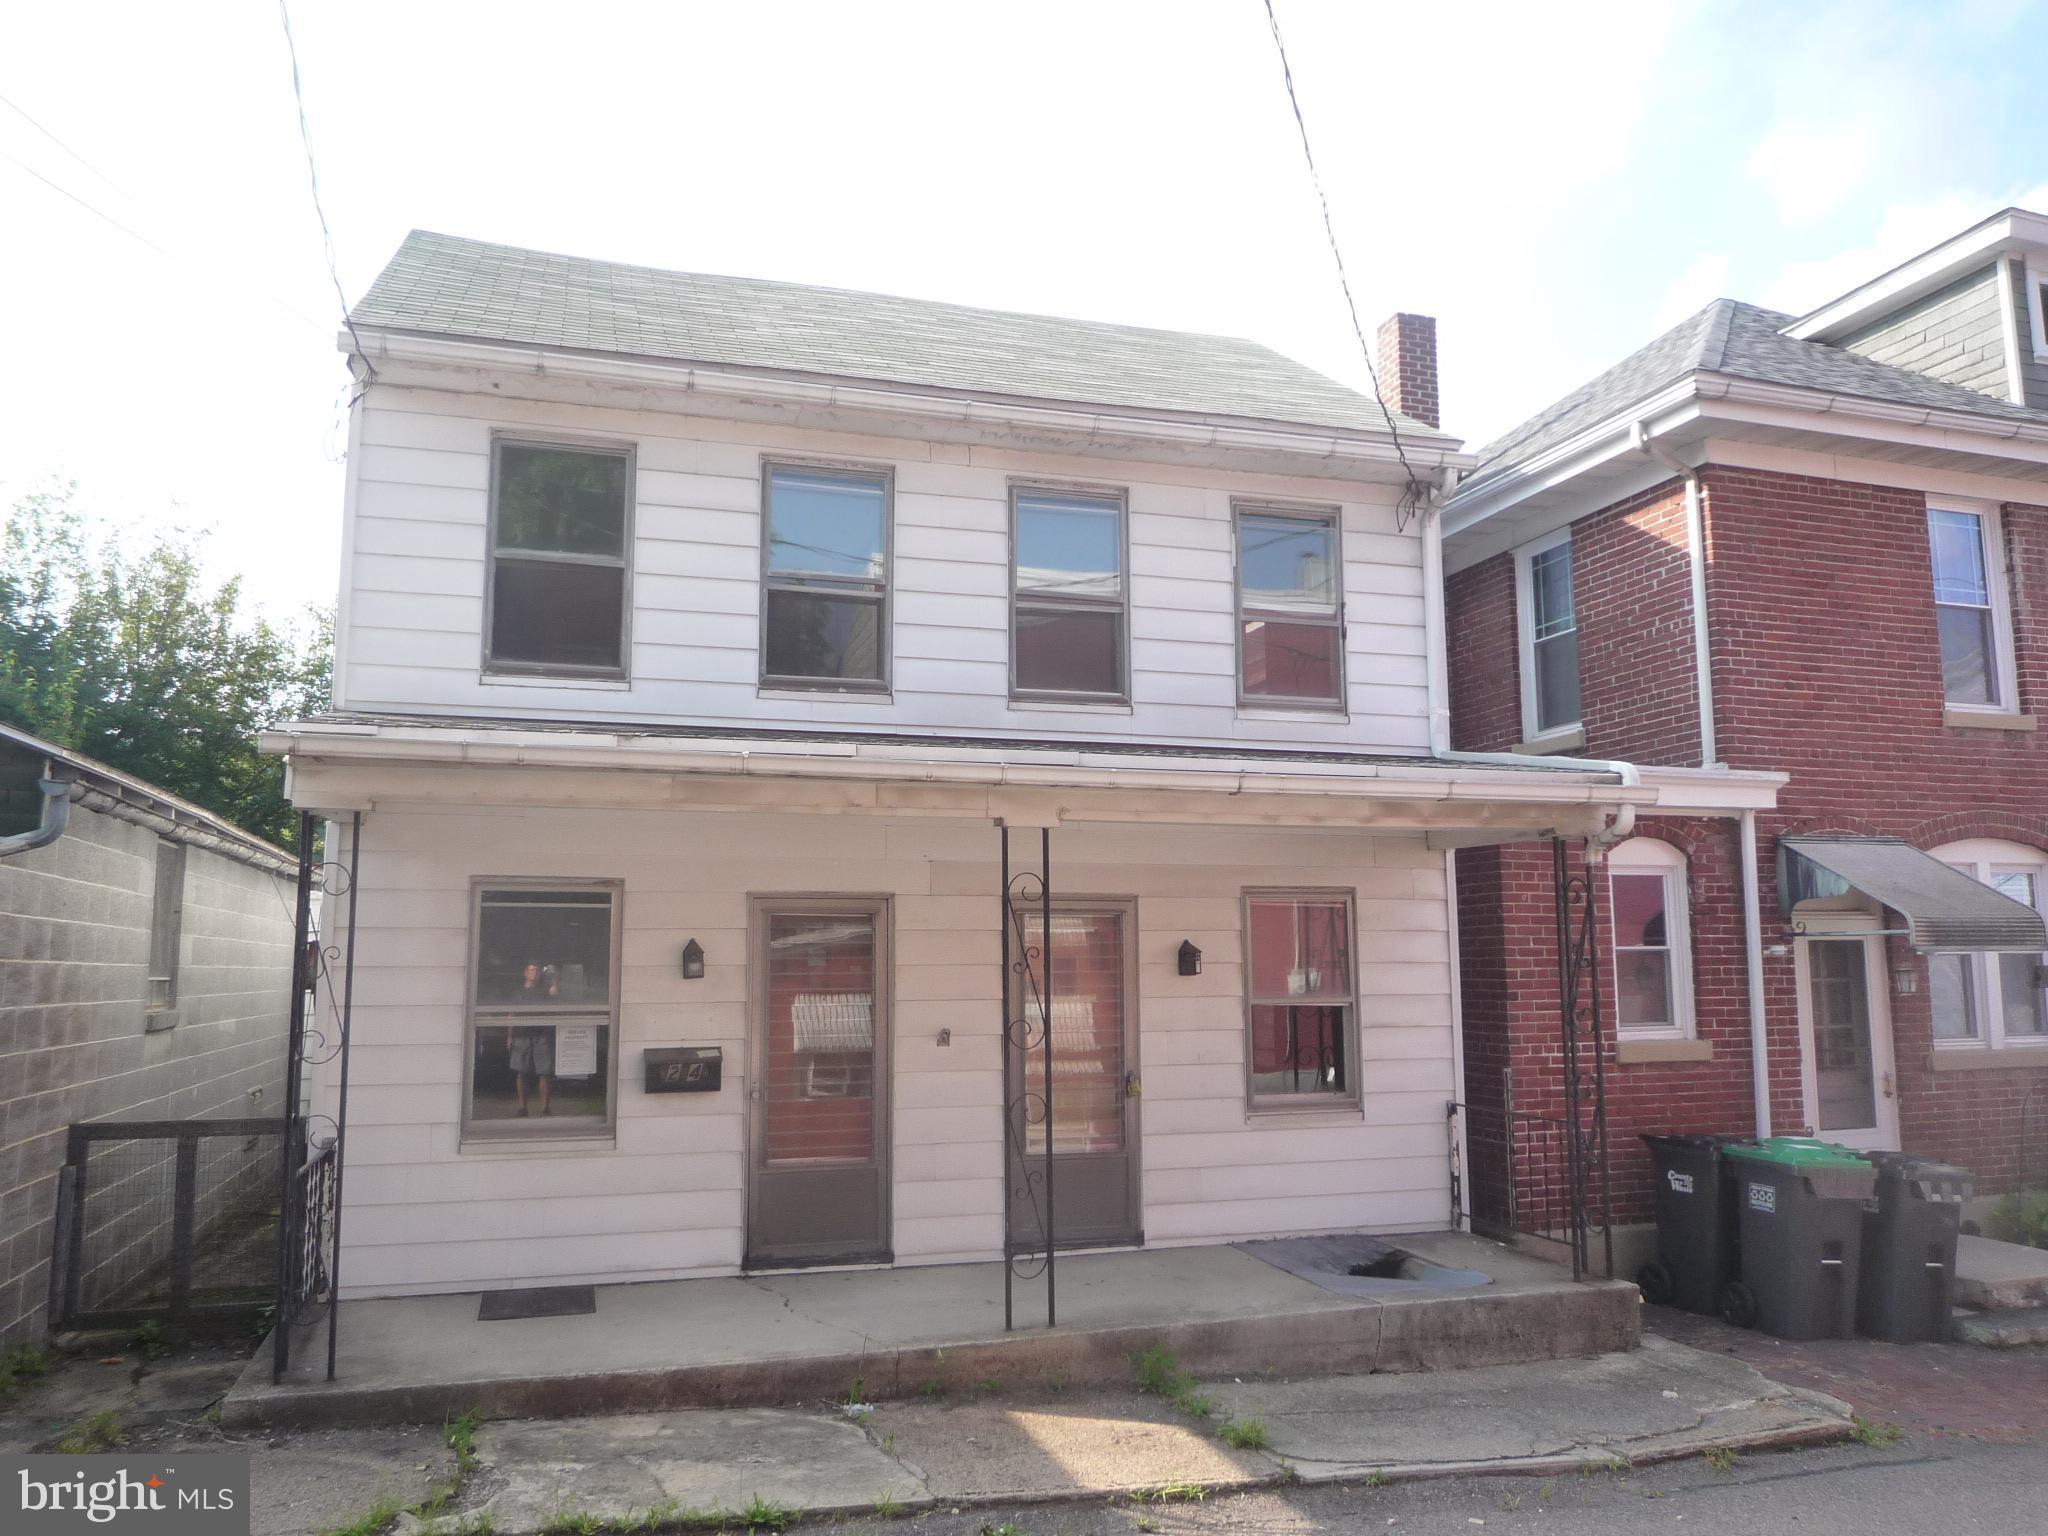 22 MAPLE STREET, CRESSONA, PA 17929